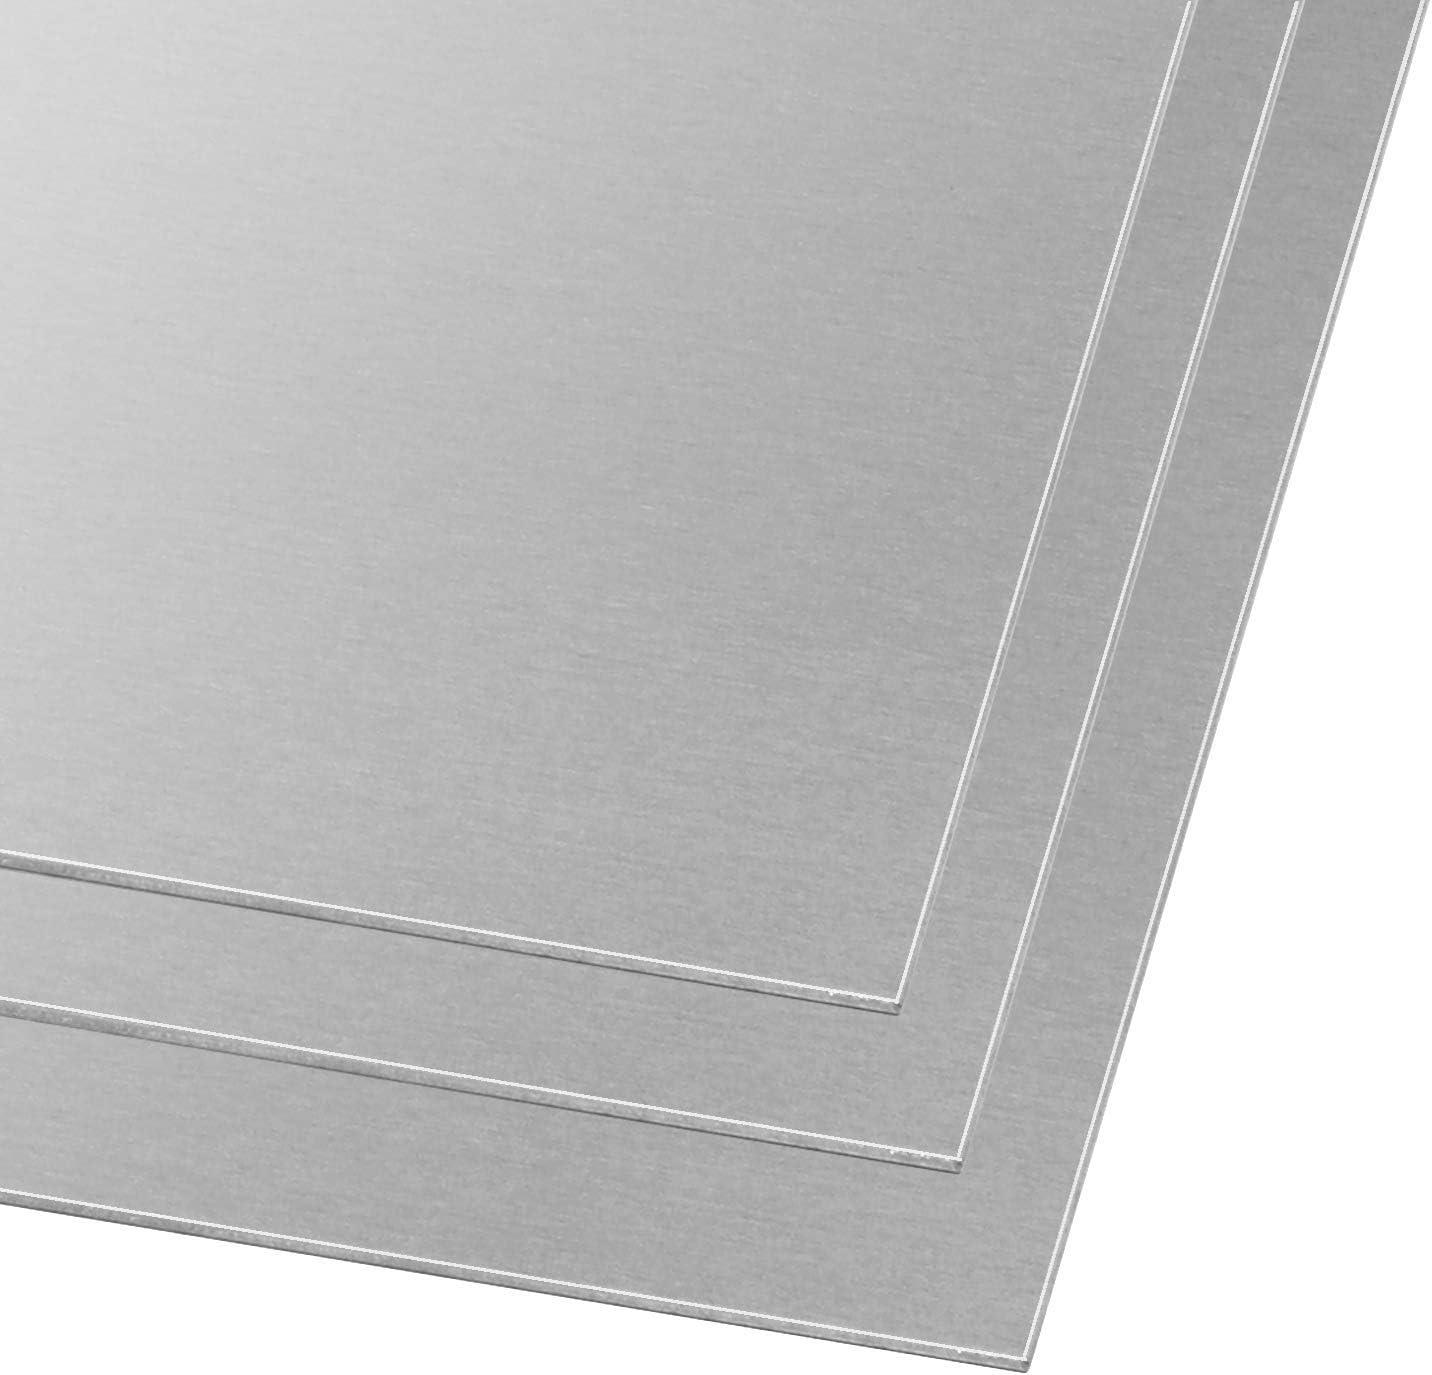 5 mm,200mm200mm4mm Plates Precision Metals Tooling Flat Sheet Multiple Thickness Optionss 4 mm DSFHKUYB Aluminum Sheet